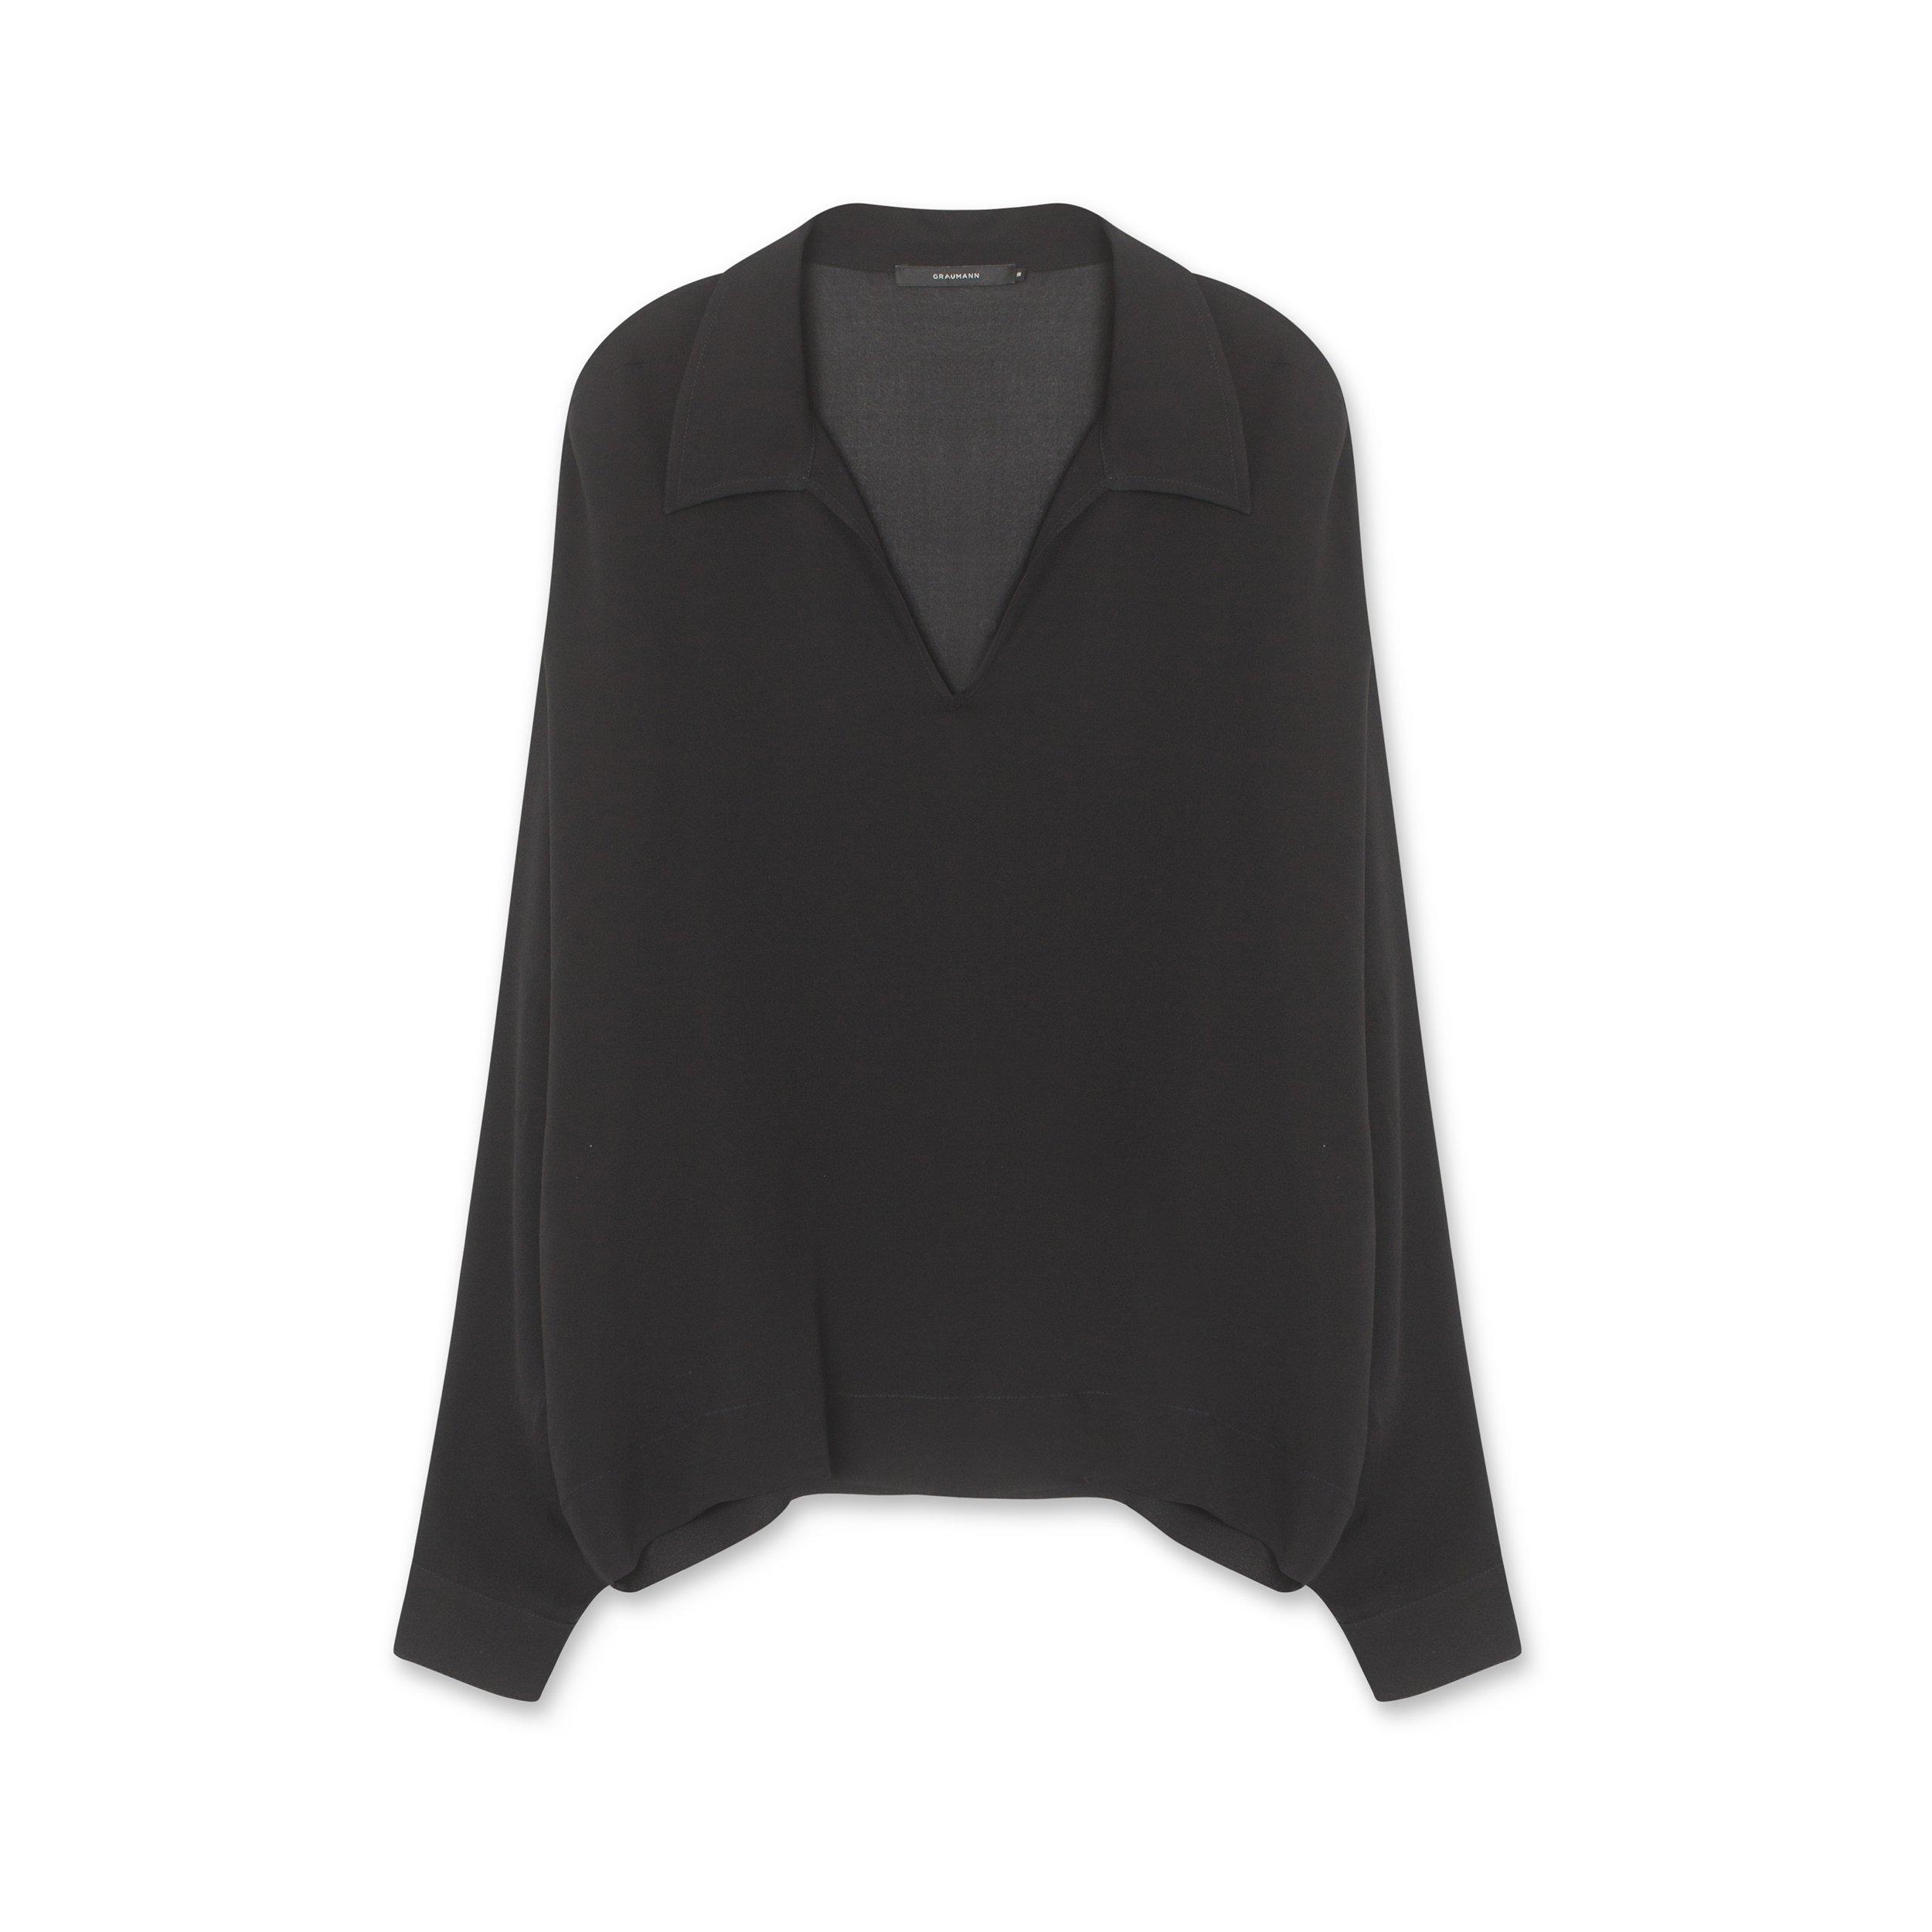 Graumann Alice Shirt - Black